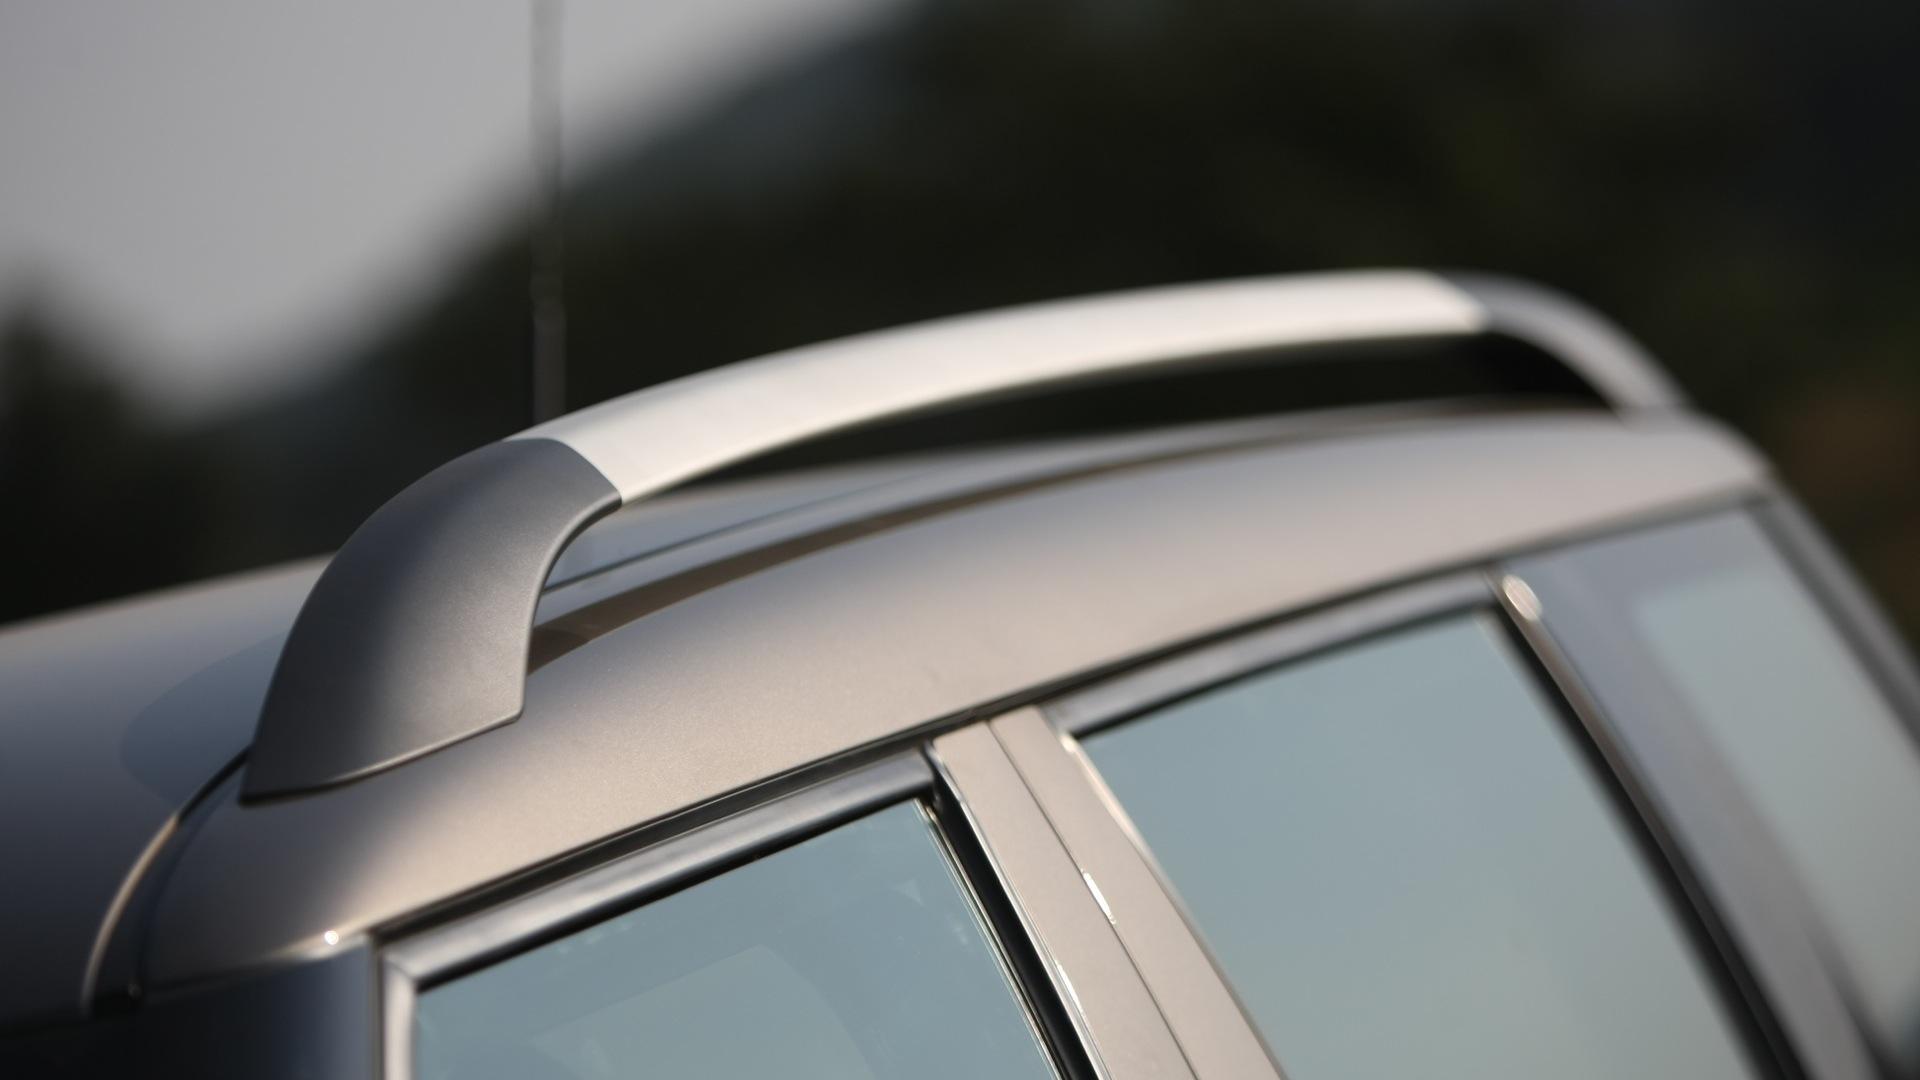 Skoda-Yeti-2013-Active-4x2-Exterior